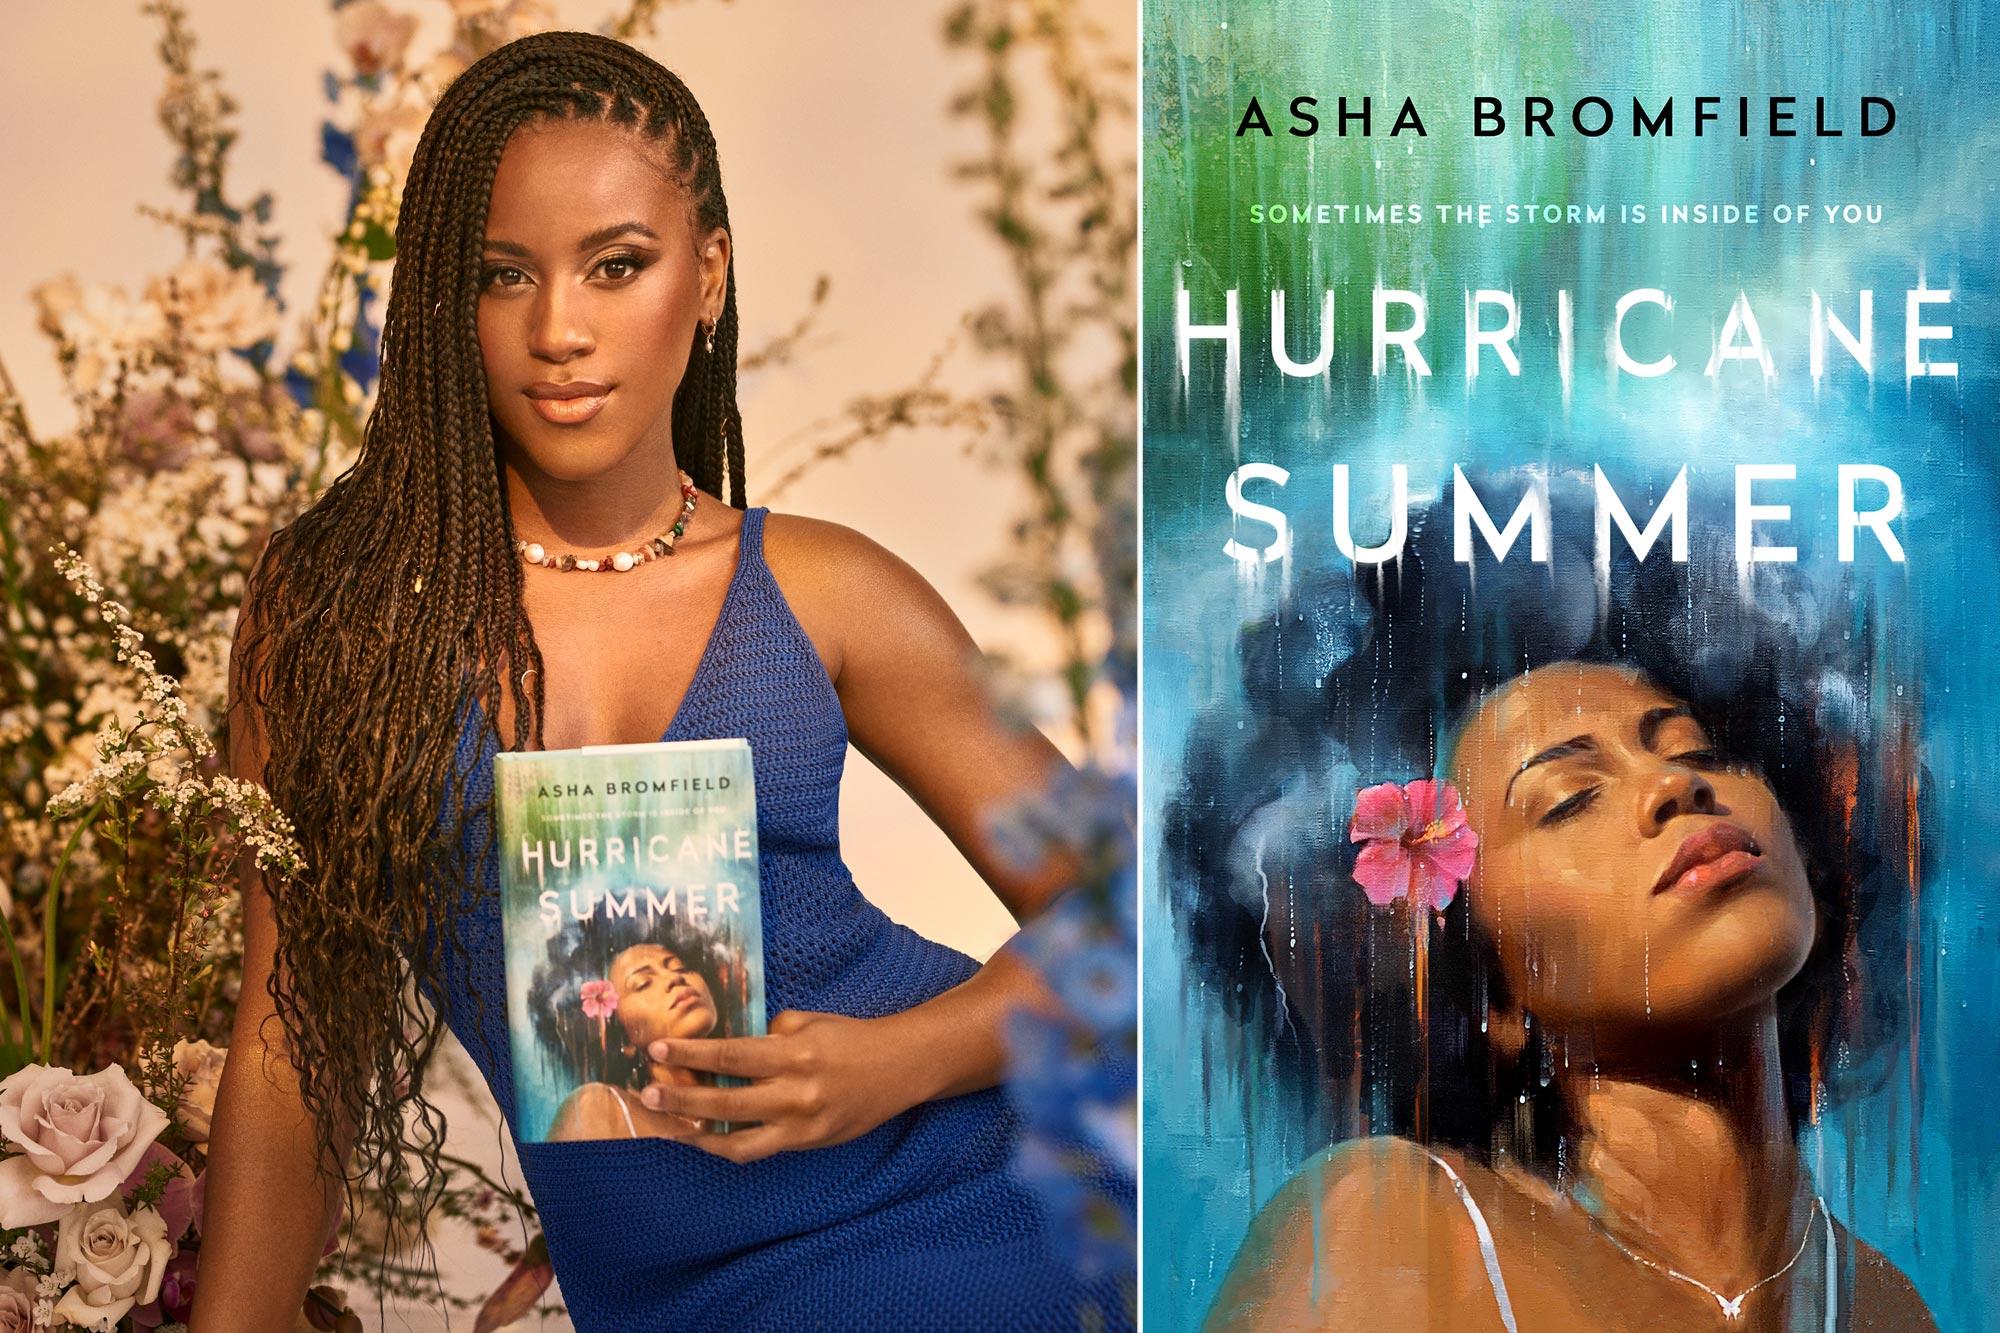 Asha Bromfield, Hurricane Summer